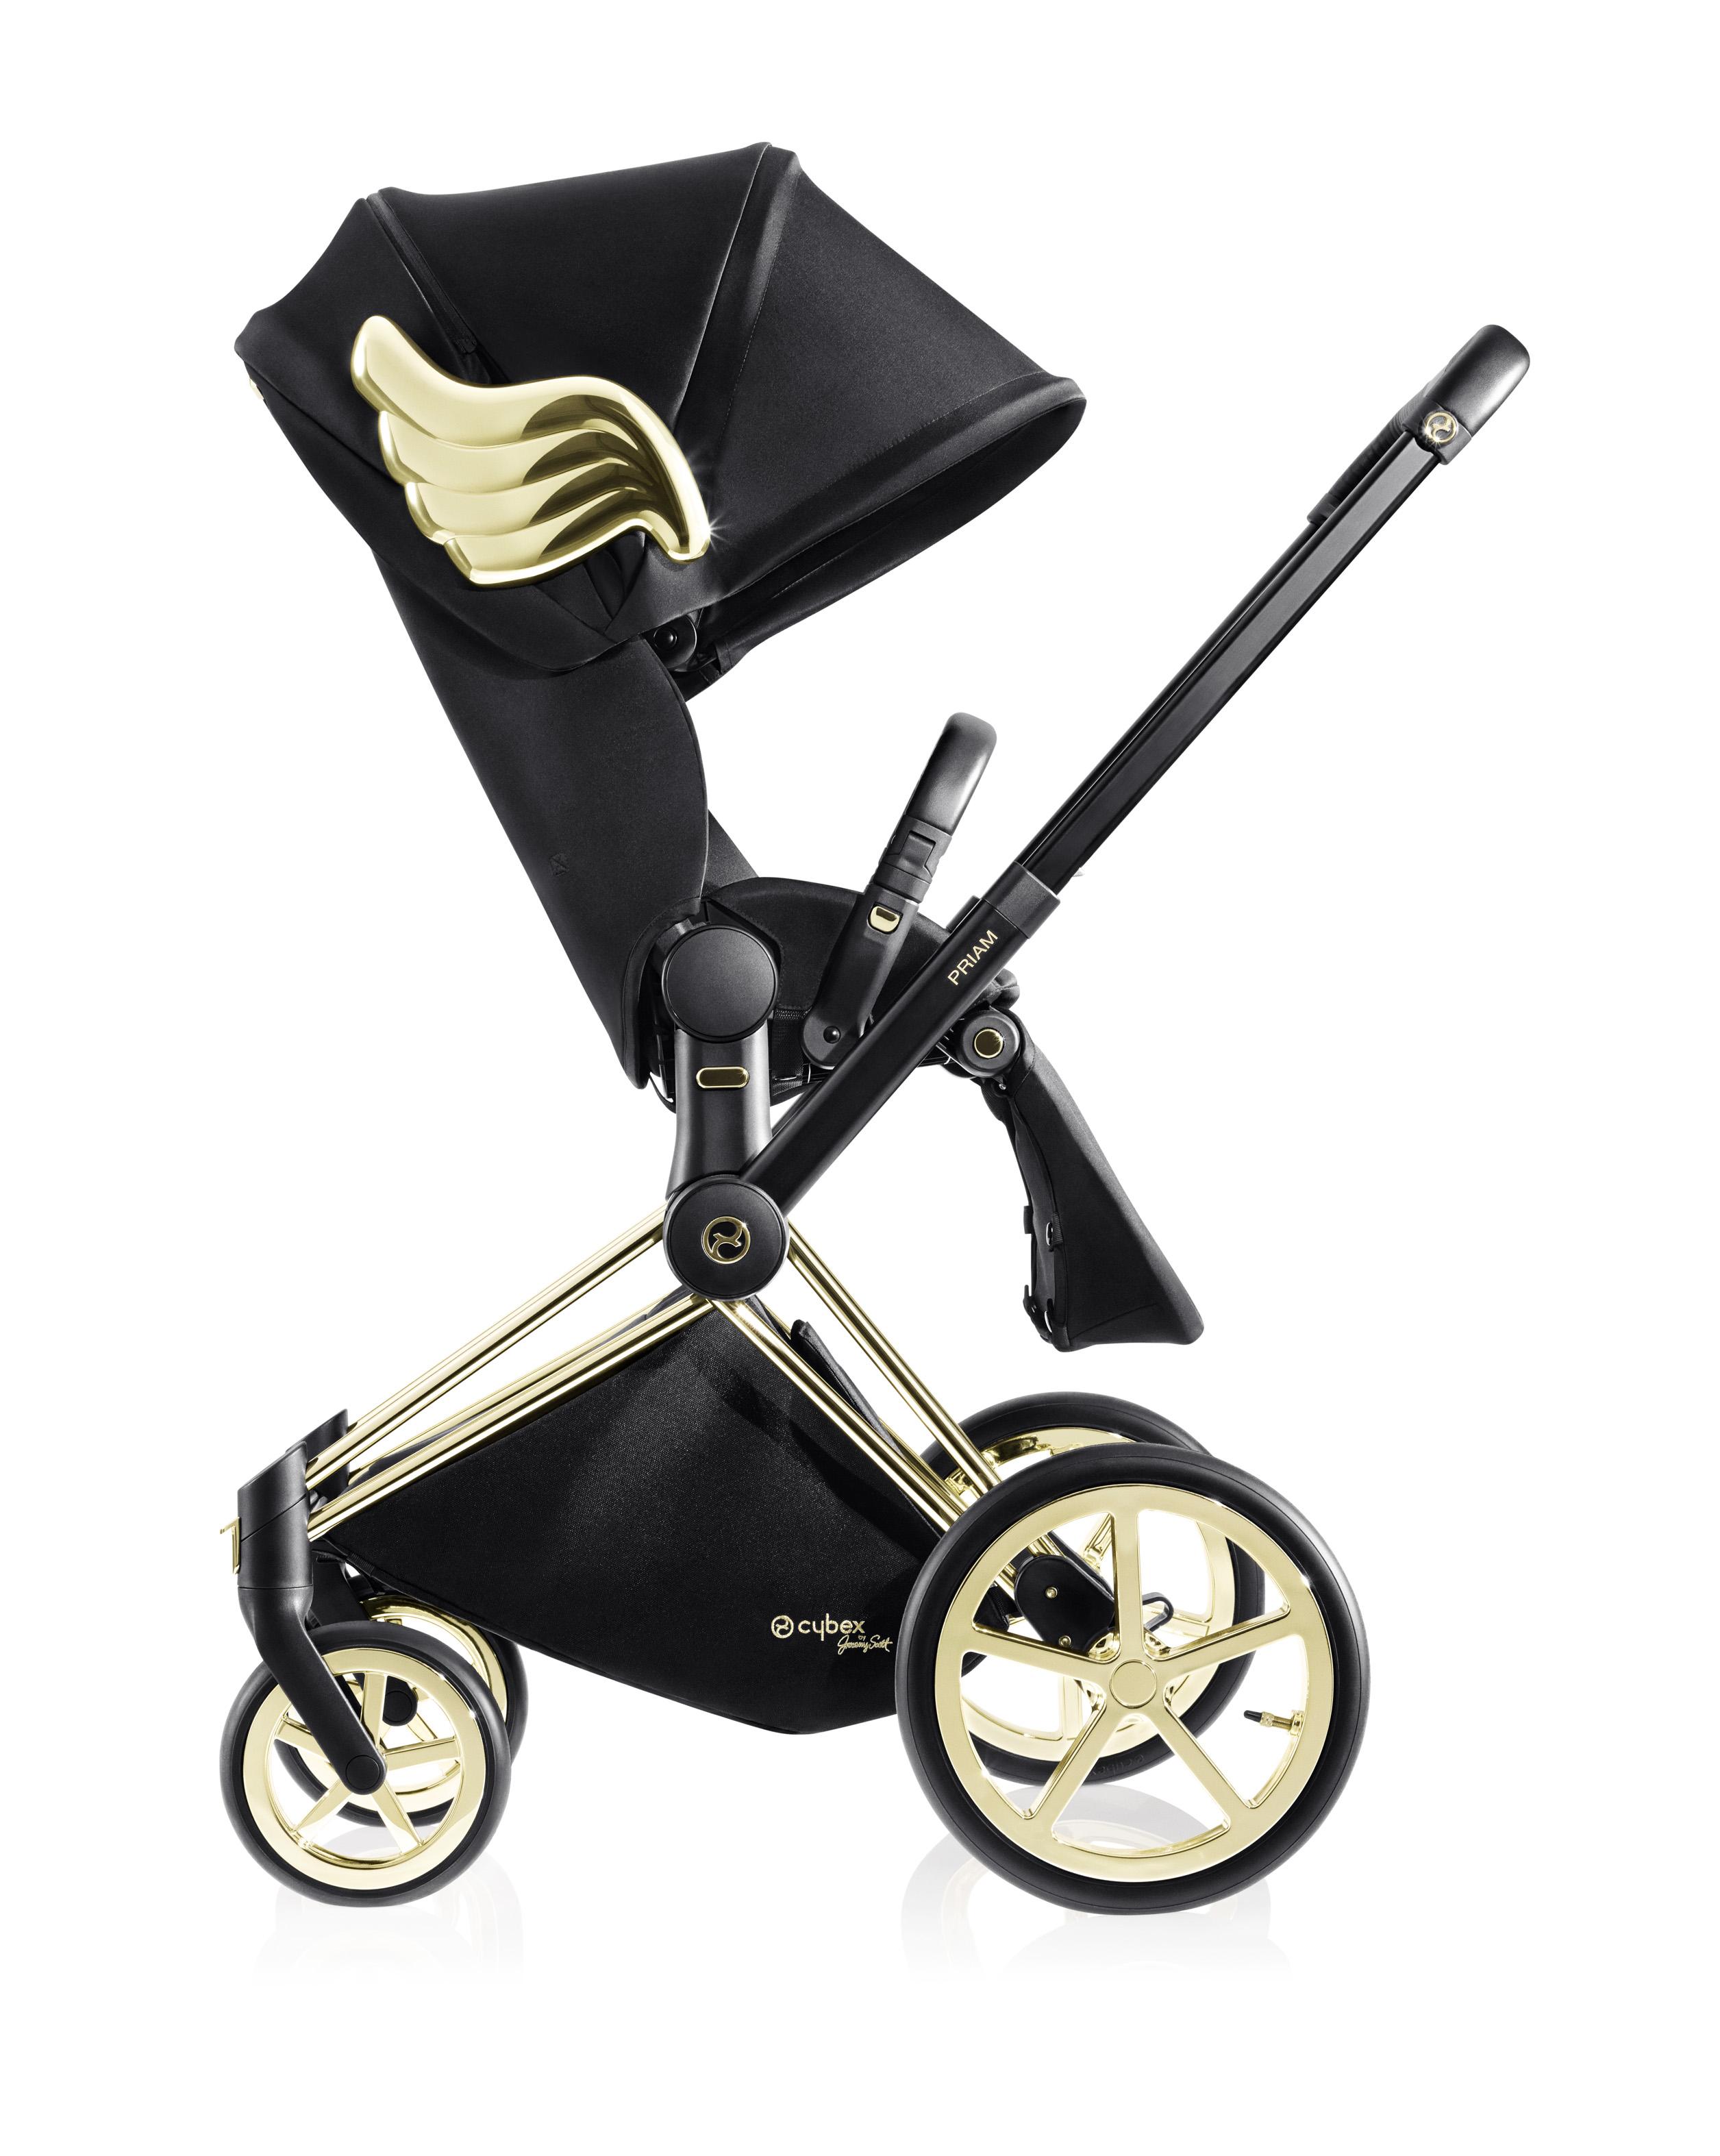 CYBEX by Jeremy ScottPriam 經典嬰兒車(車架+座騎)NT82,000